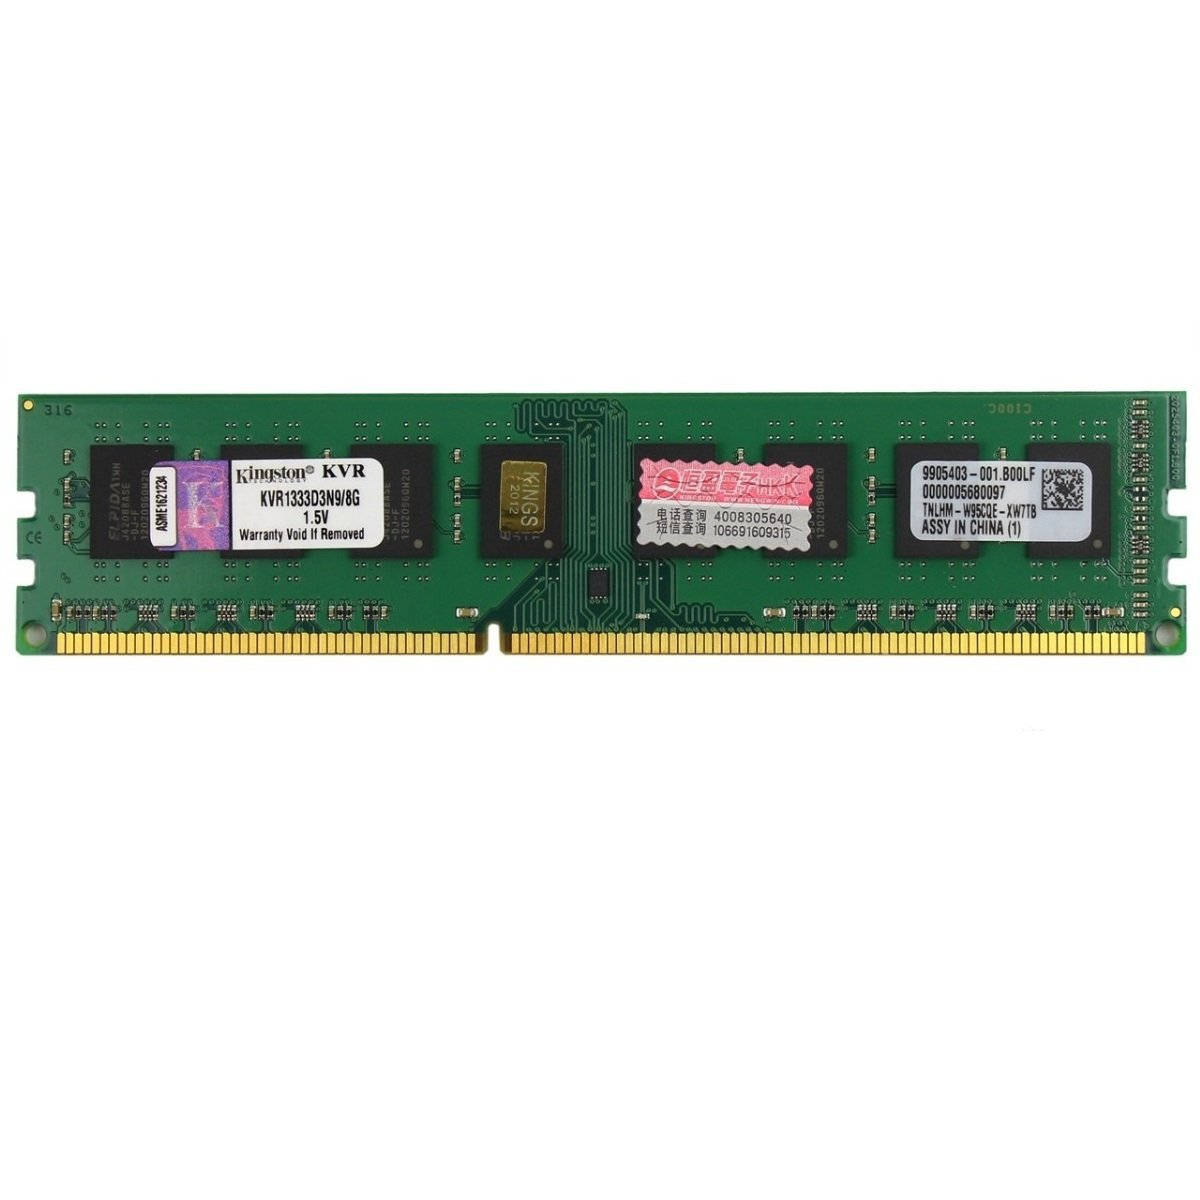 memoria ddr3 8gb pc1333 kingston kvr1333d3n9 8g 6996 2000 200465